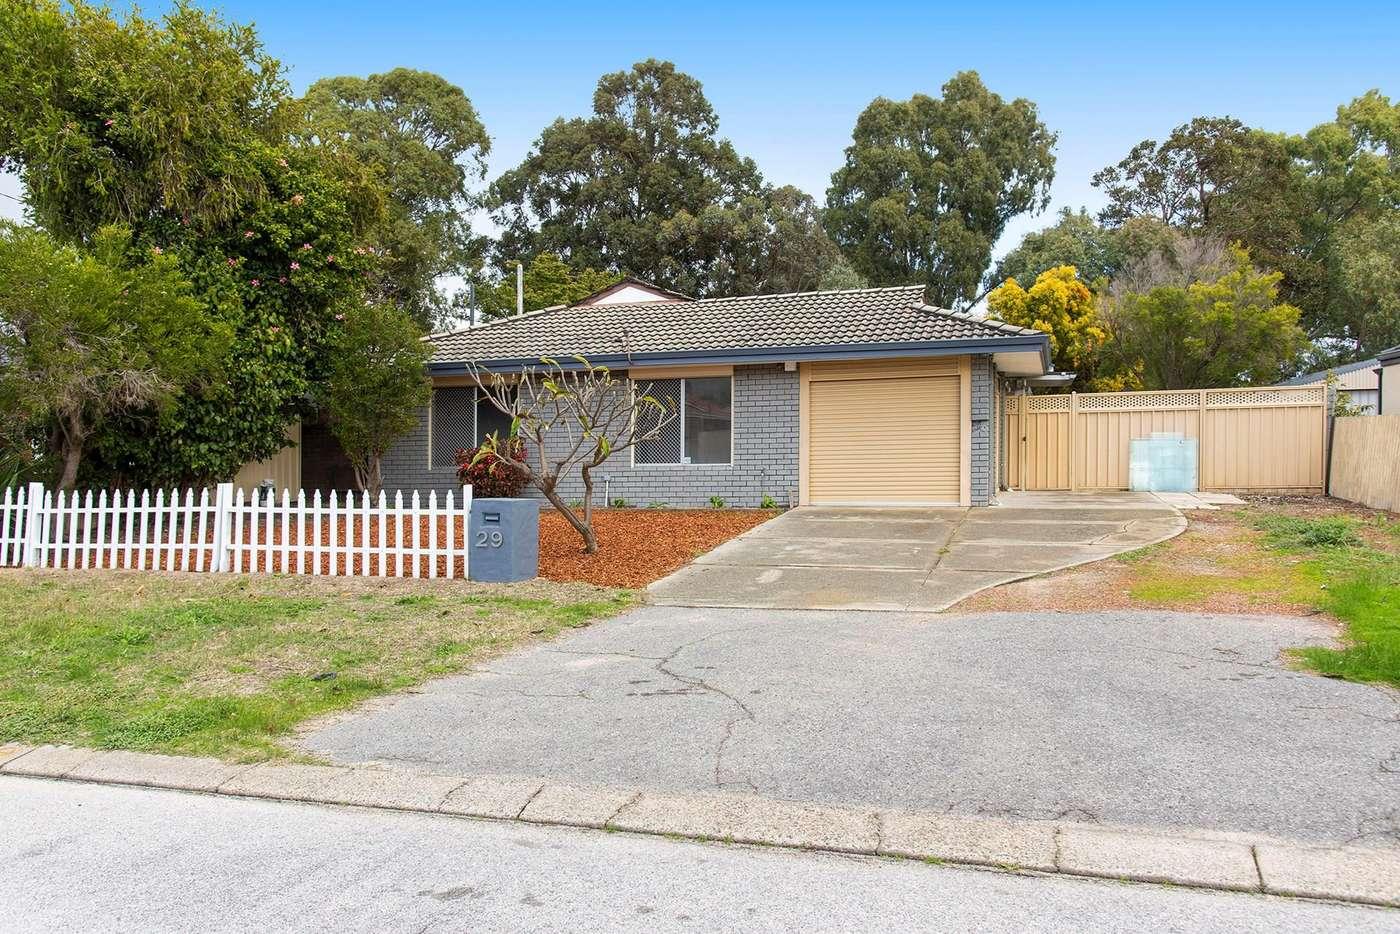 Main view of Homely house listing, 29 Woburn Way, Kelmscott WA 6111